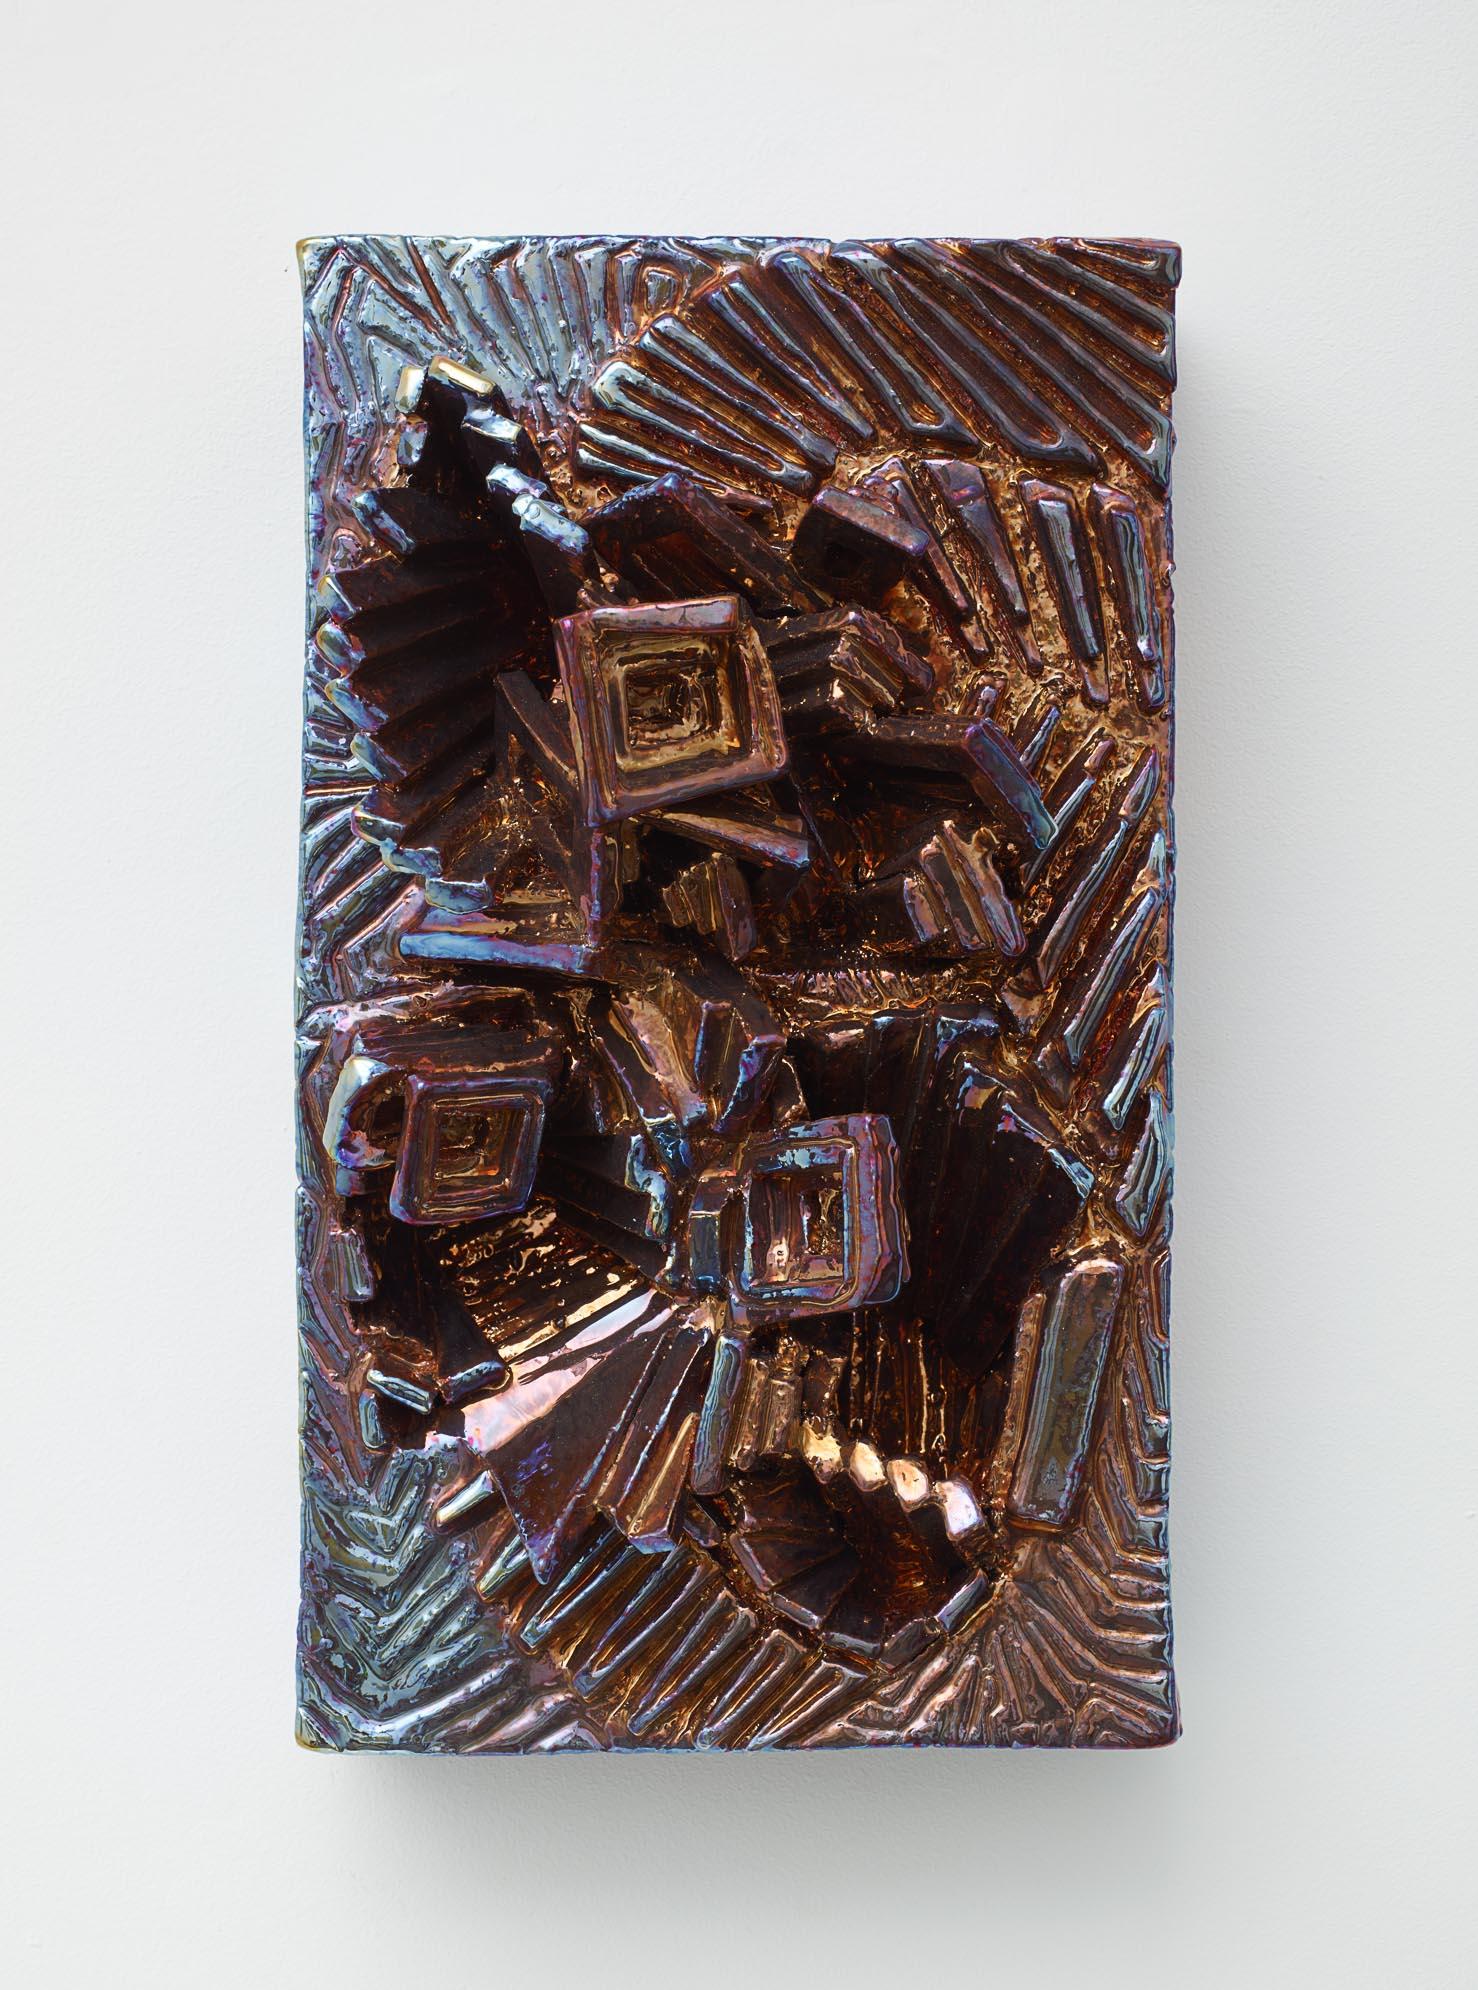 Julia Kunin,  Copper and Blue Portrait , 2014, Ceramic, 15 x 9 x 6 inches